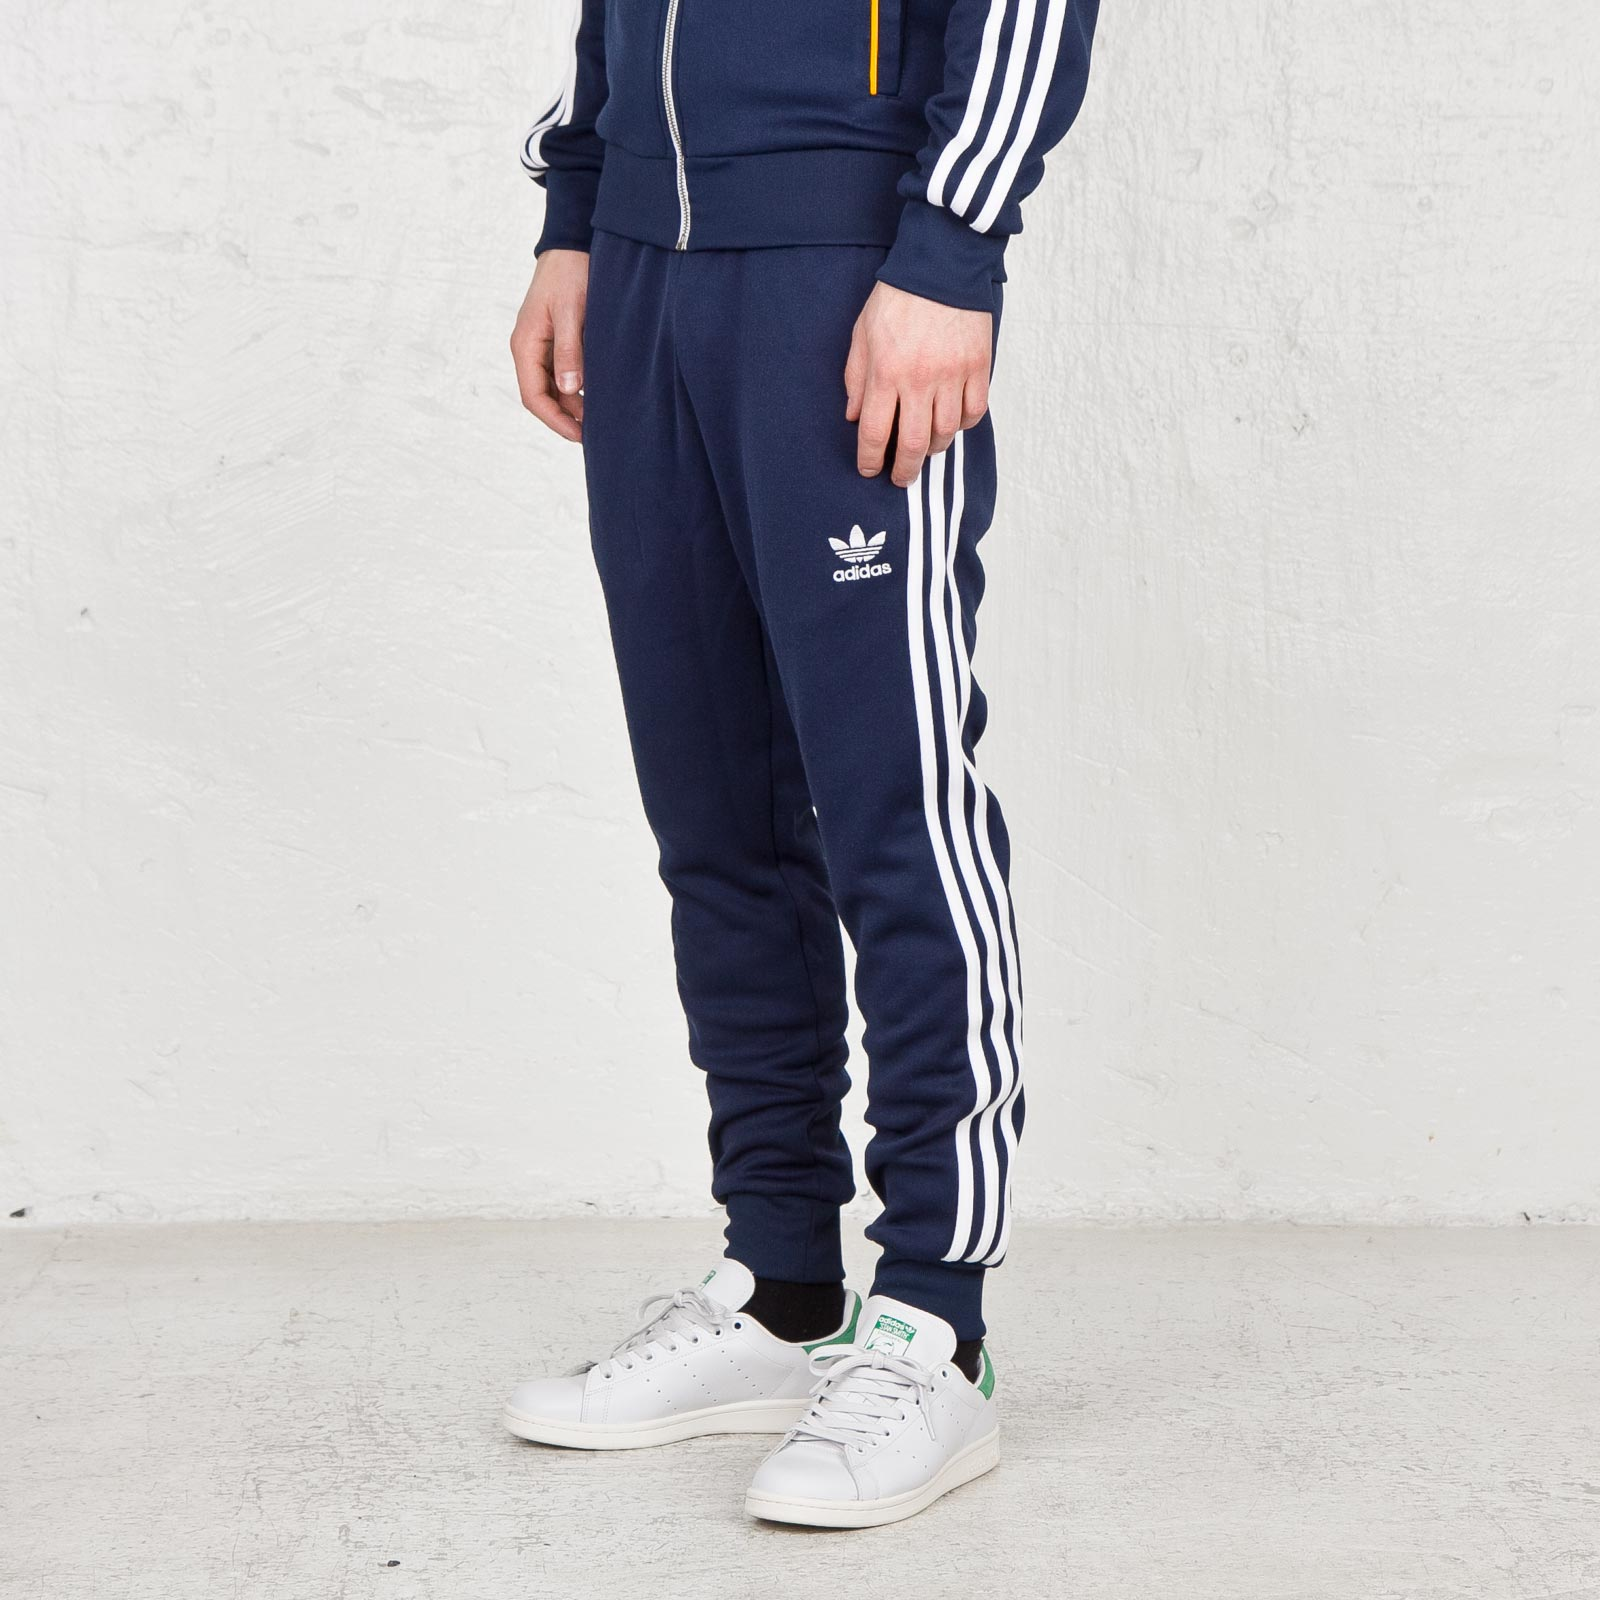 online store 2cf5b c9125 adidas Superstar Cuffed Track Pants - S89368 - Sneakersnstuff   sneakers    streetwear online since 1999